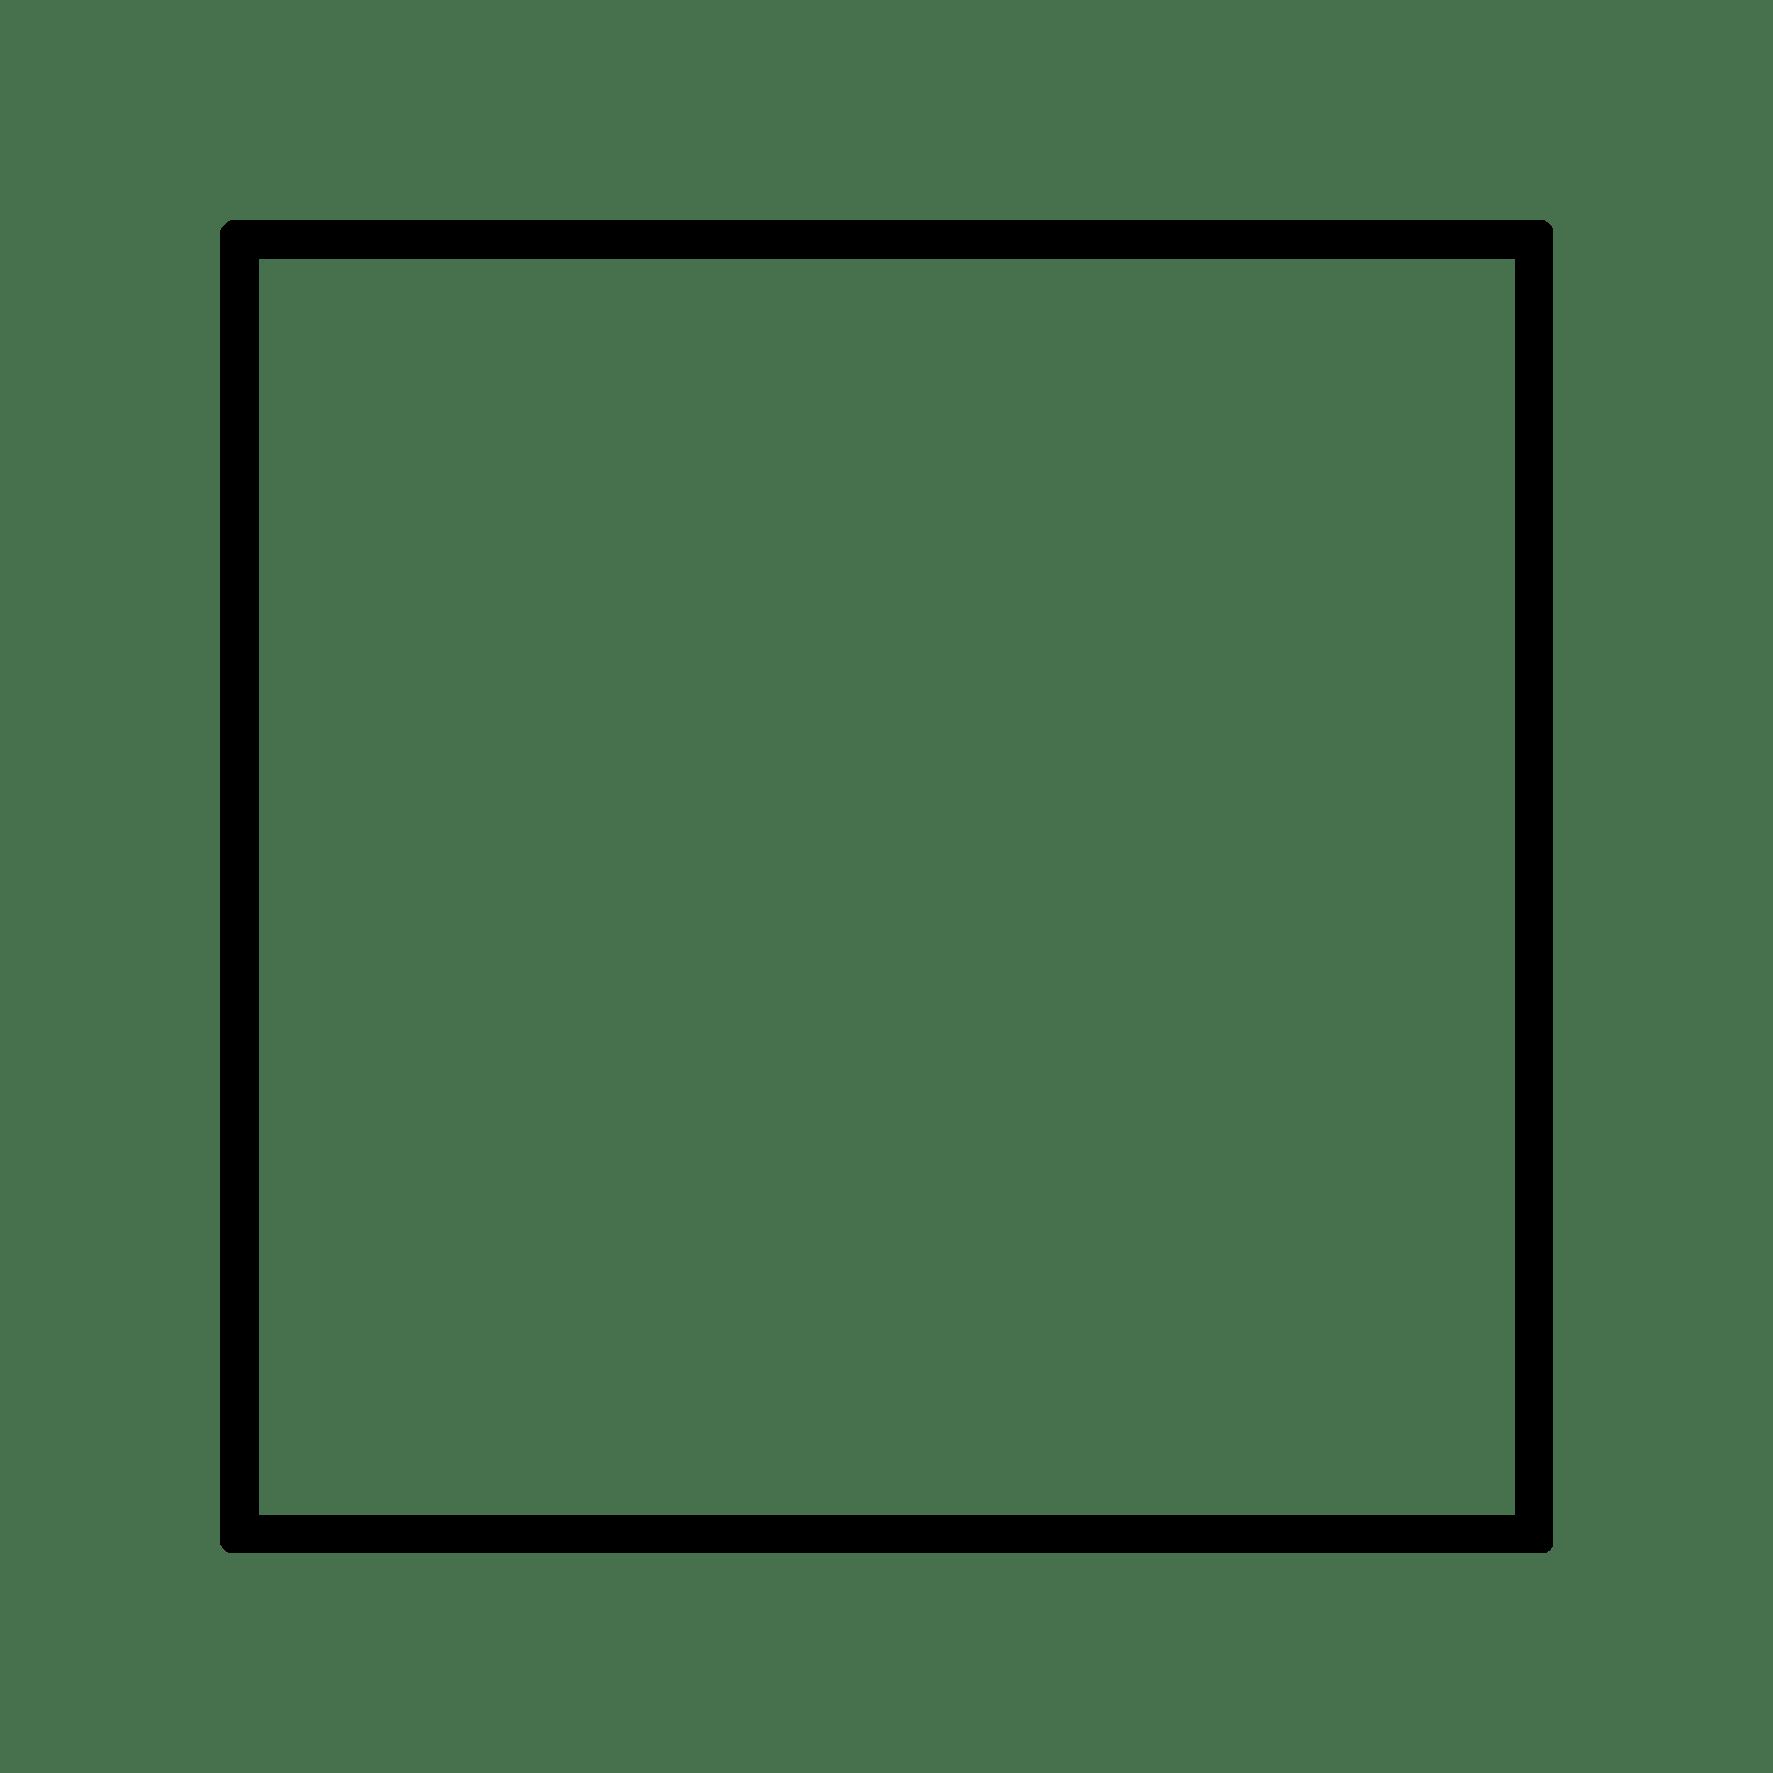 Square Box Overlay Icon Tumblr Doddle Black